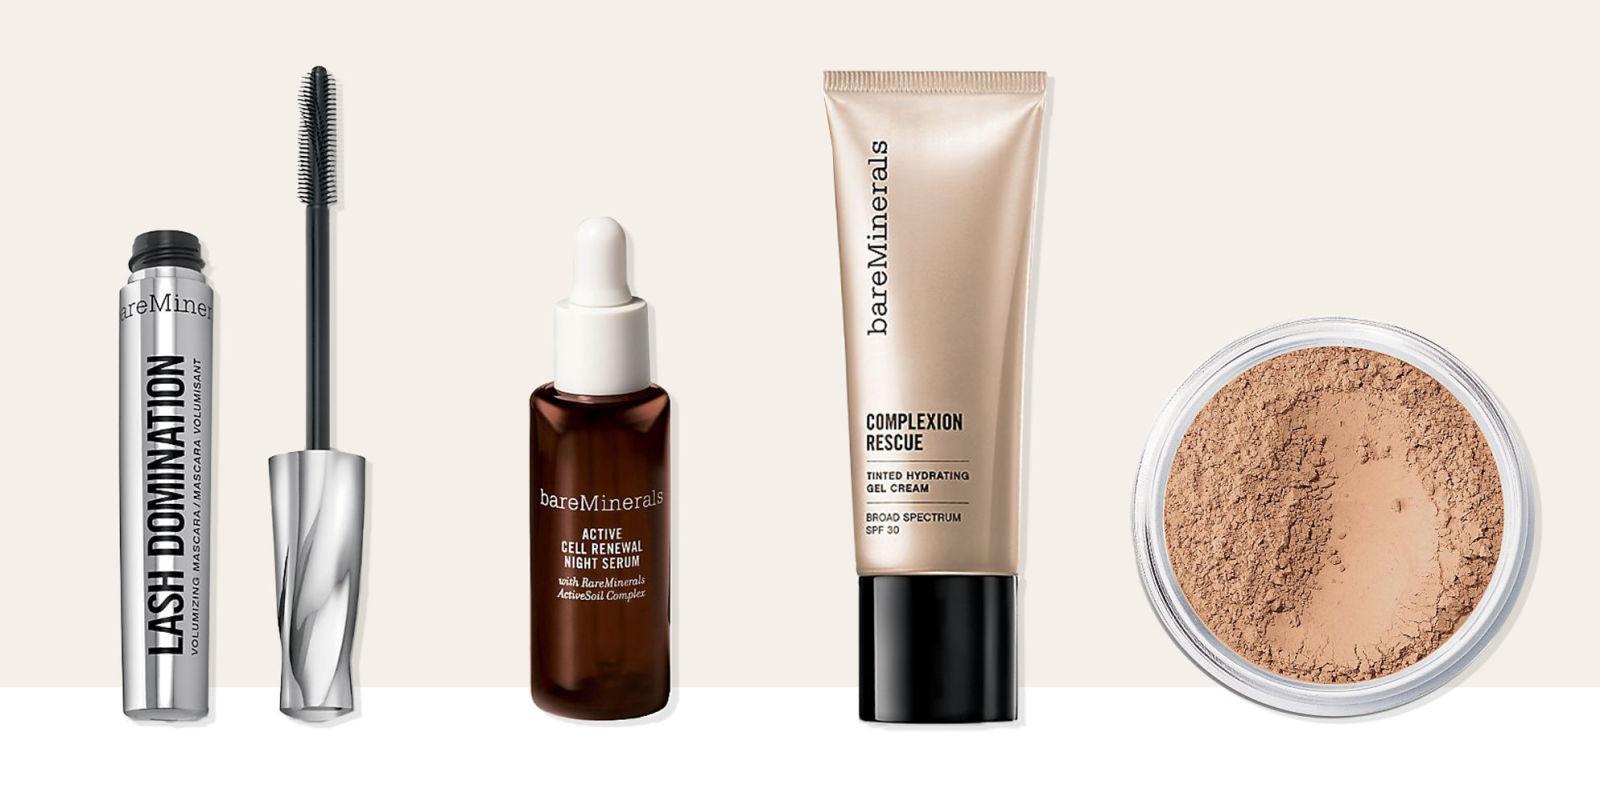 9 best bare minerals makeup skincare products 2018 bareminerals reviews. Black Bedroom Furniture Sets. Home Design Ideas